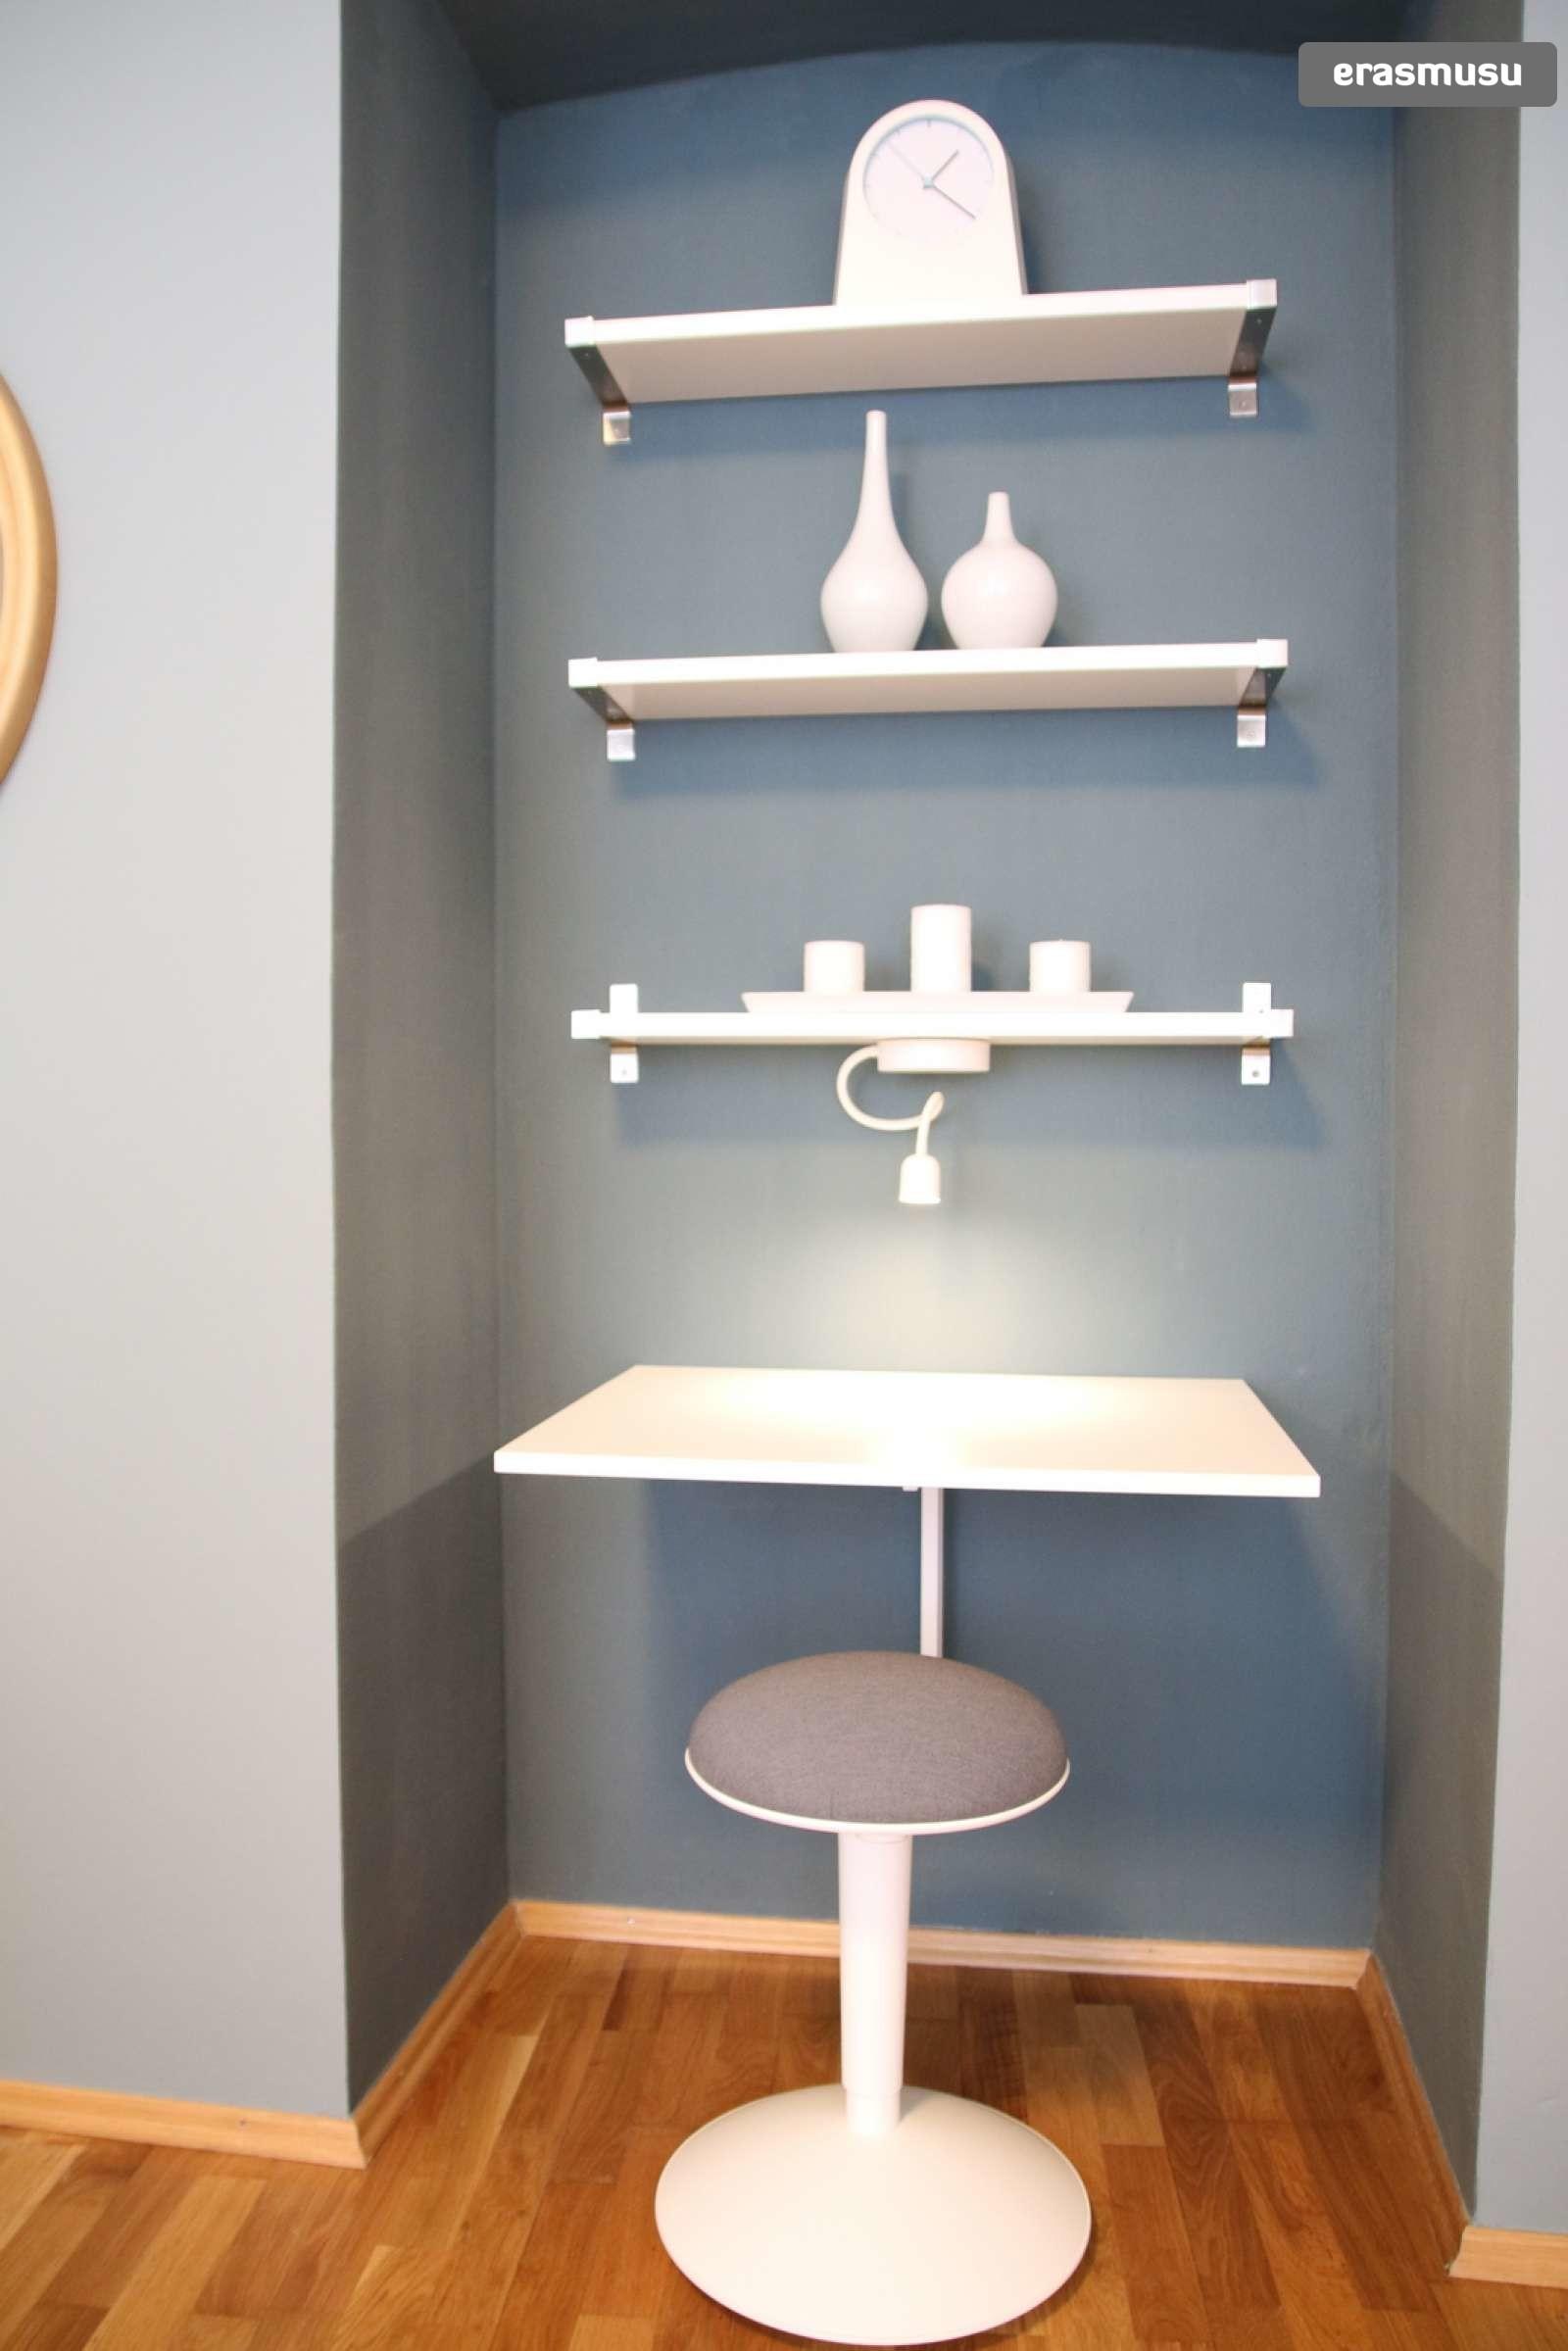 charming-studio-apartment-rent-wahring-2c6293b21556db3075e742e0a